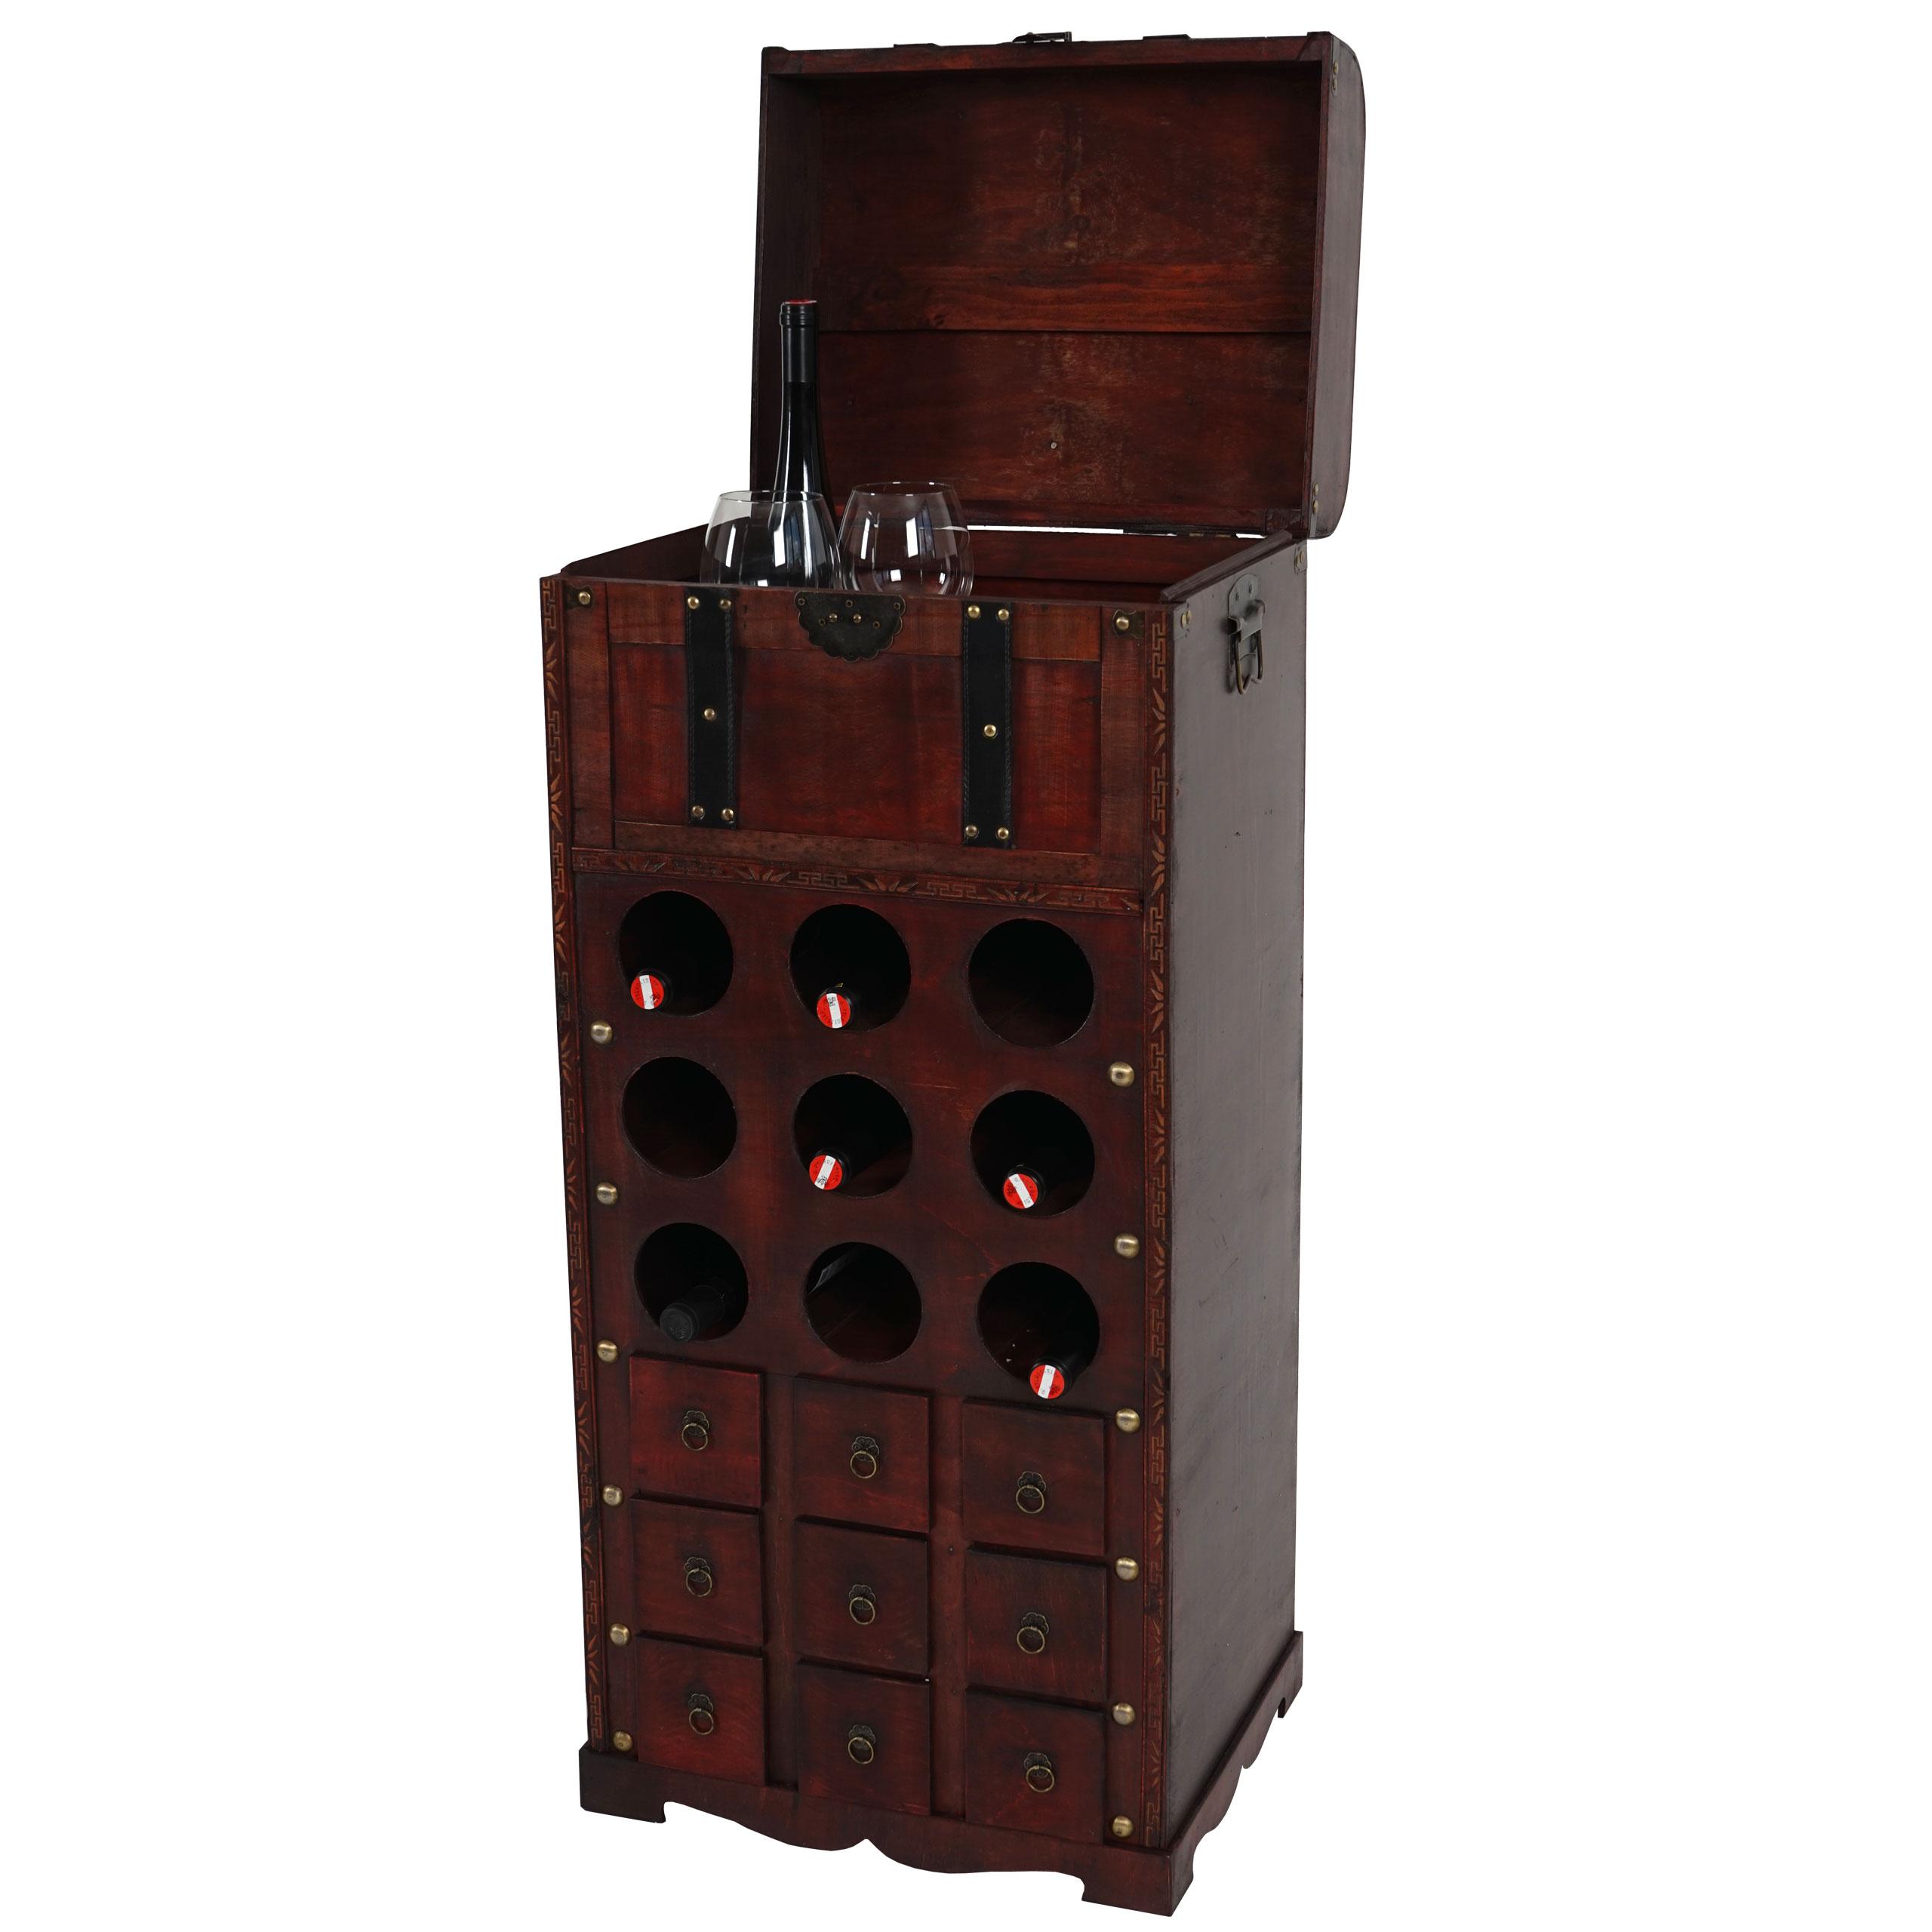 weinregal rhone t251 regal holzregal f r 9 flaschen. Black Bedroom Furniture Sets. Home Design Ideas